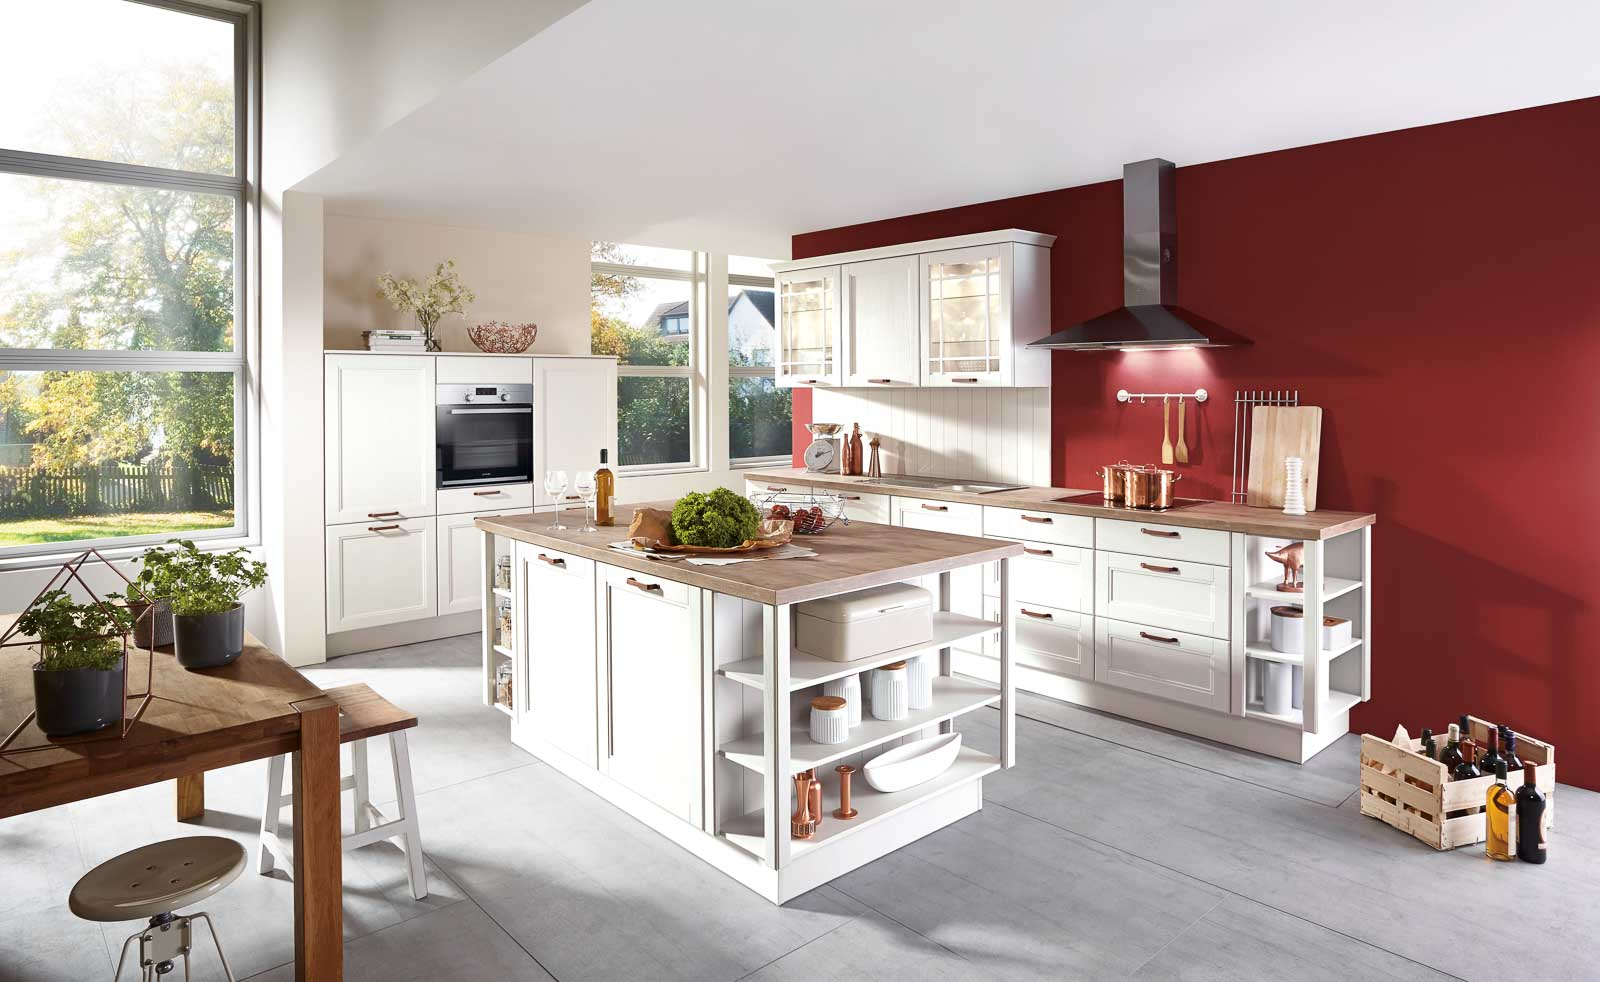 Nobilia Küchen - Modell York - 905